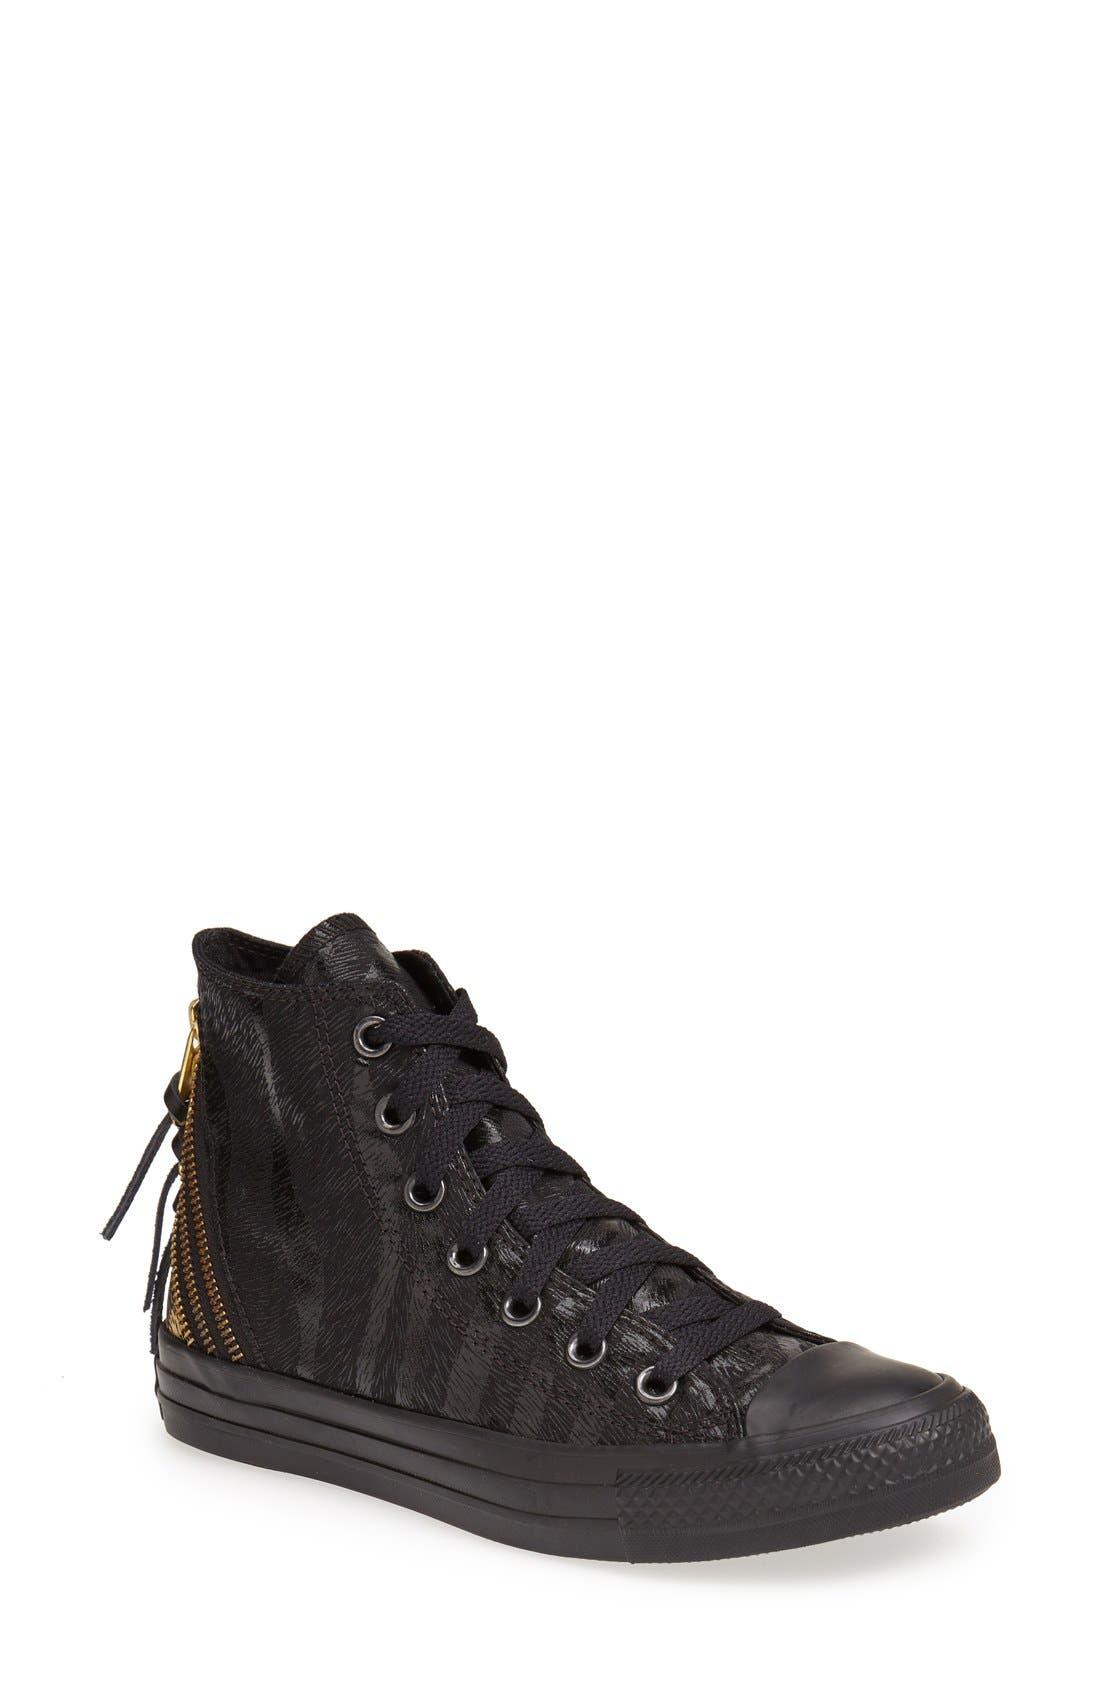 Main Image - Converse Chuck Taylor® All Star® 'Tri Zip' High Top Sneaker (Women)